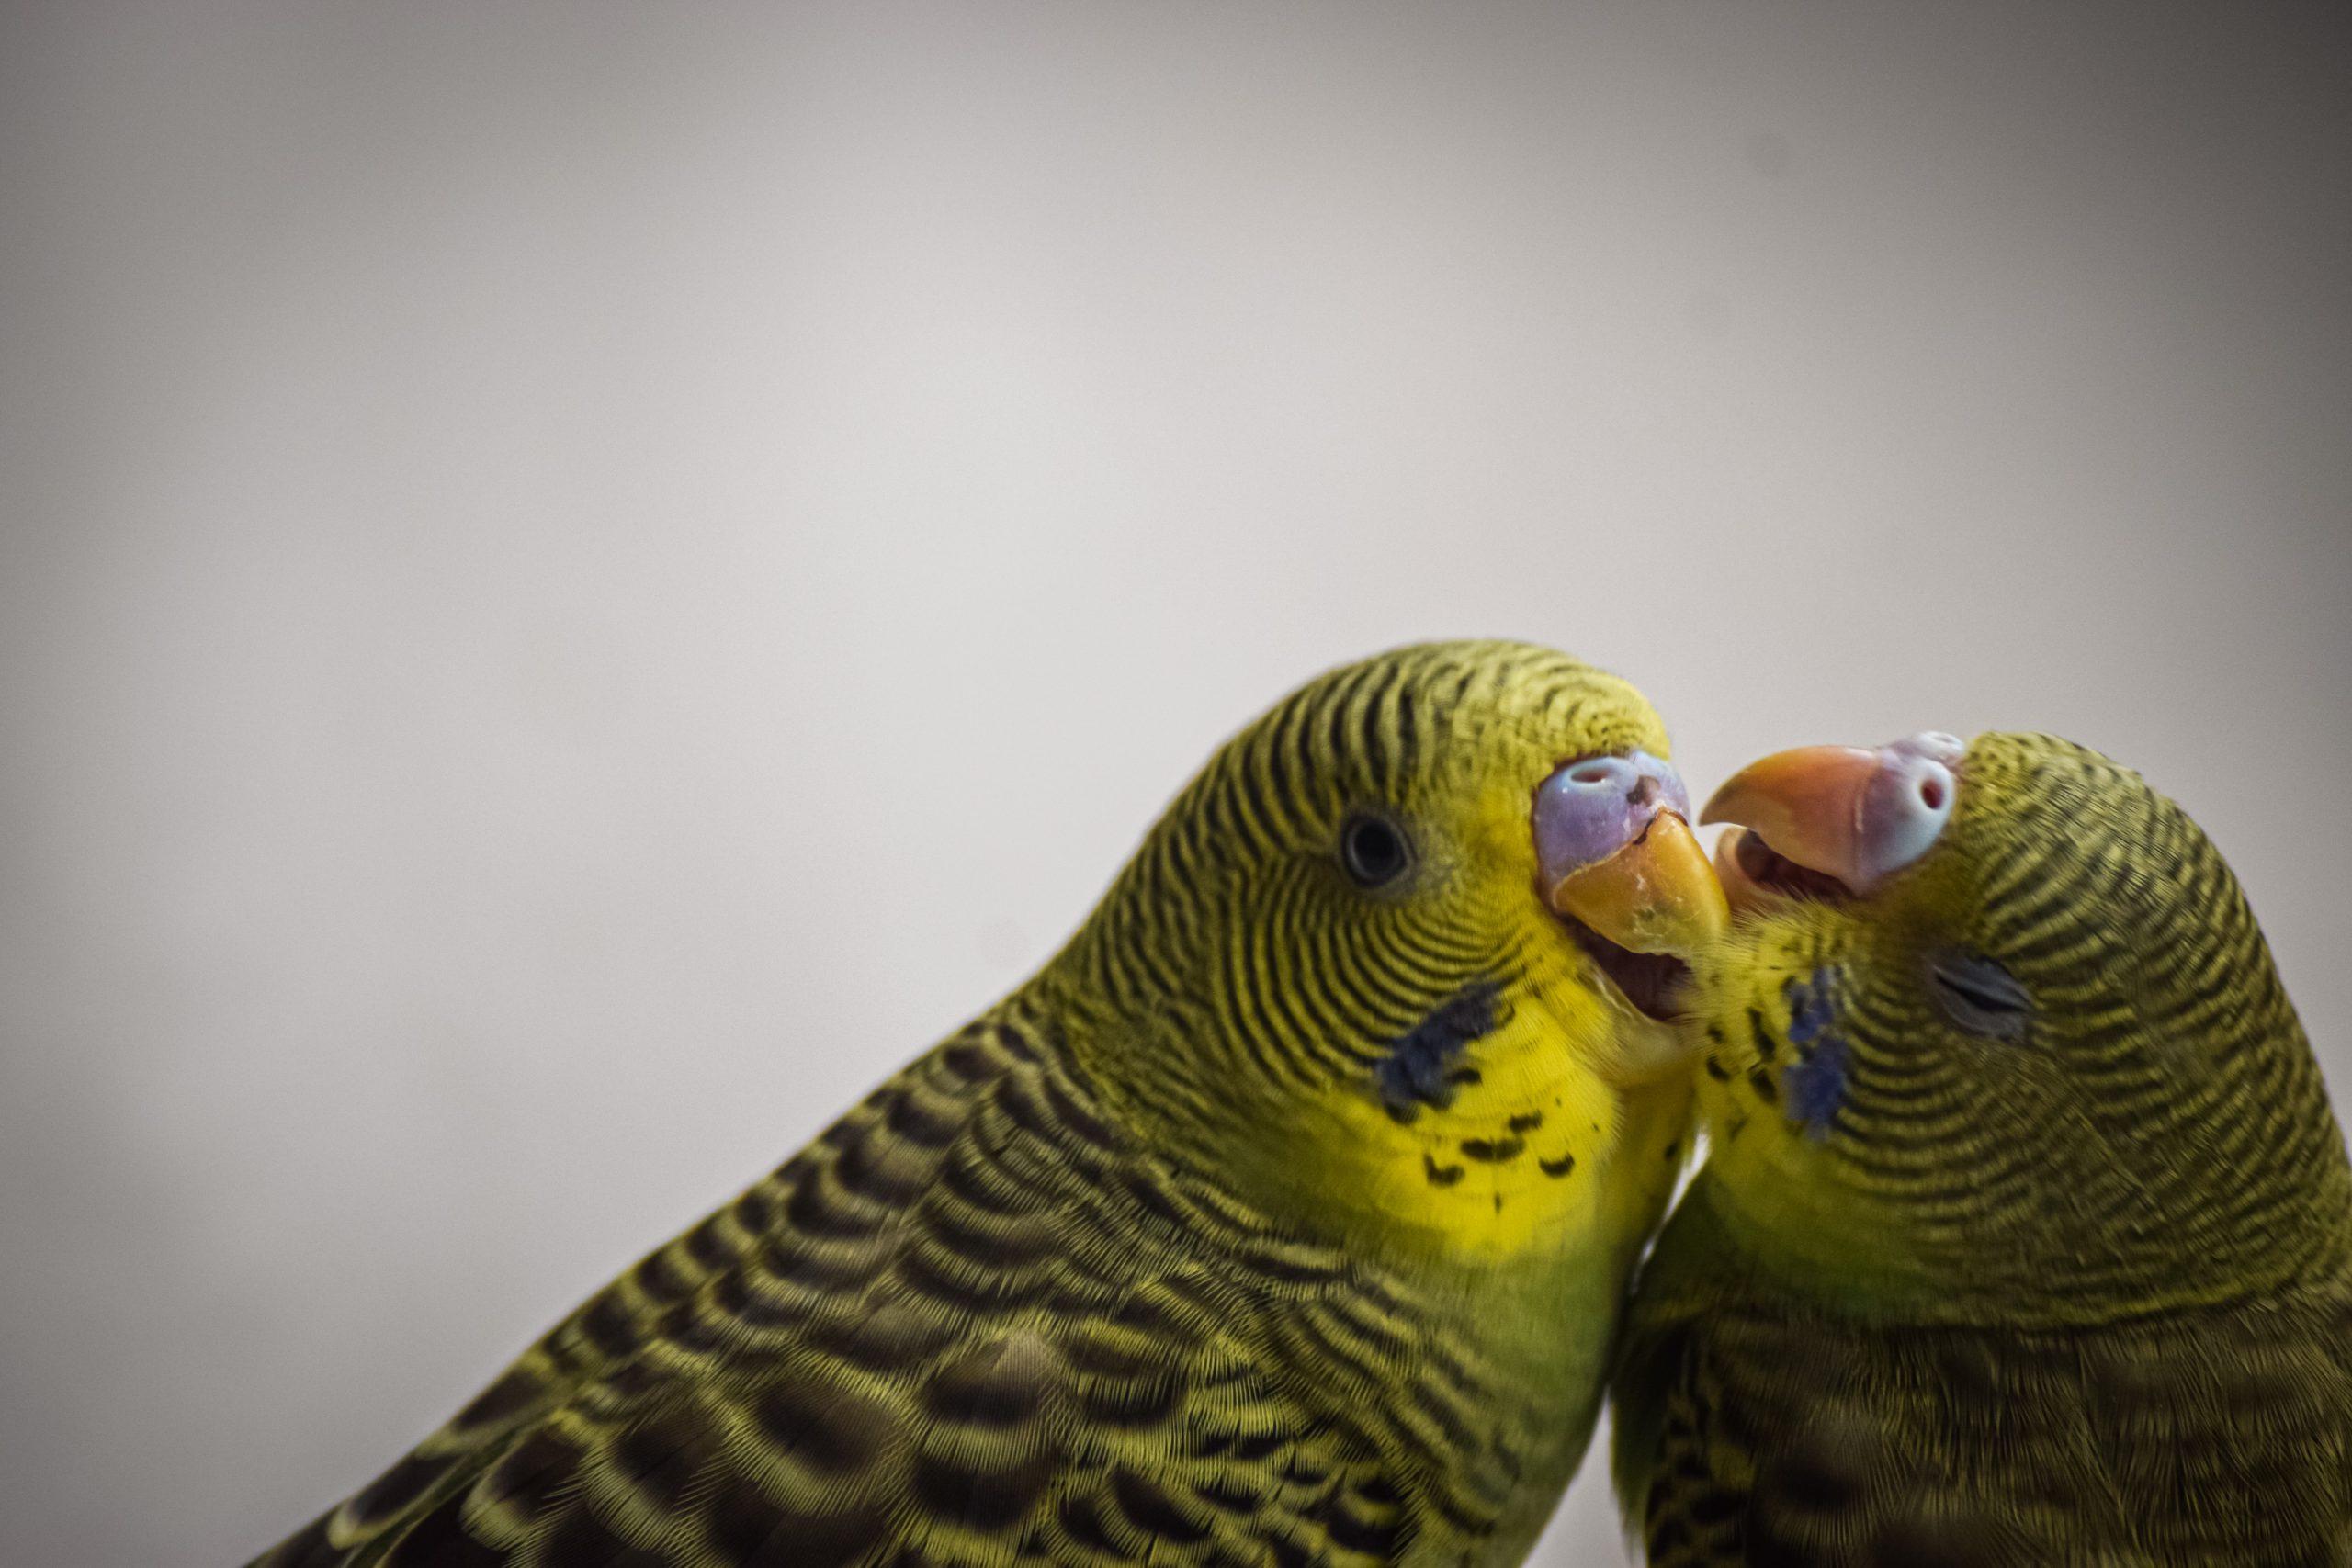 Affectionate lovebirds